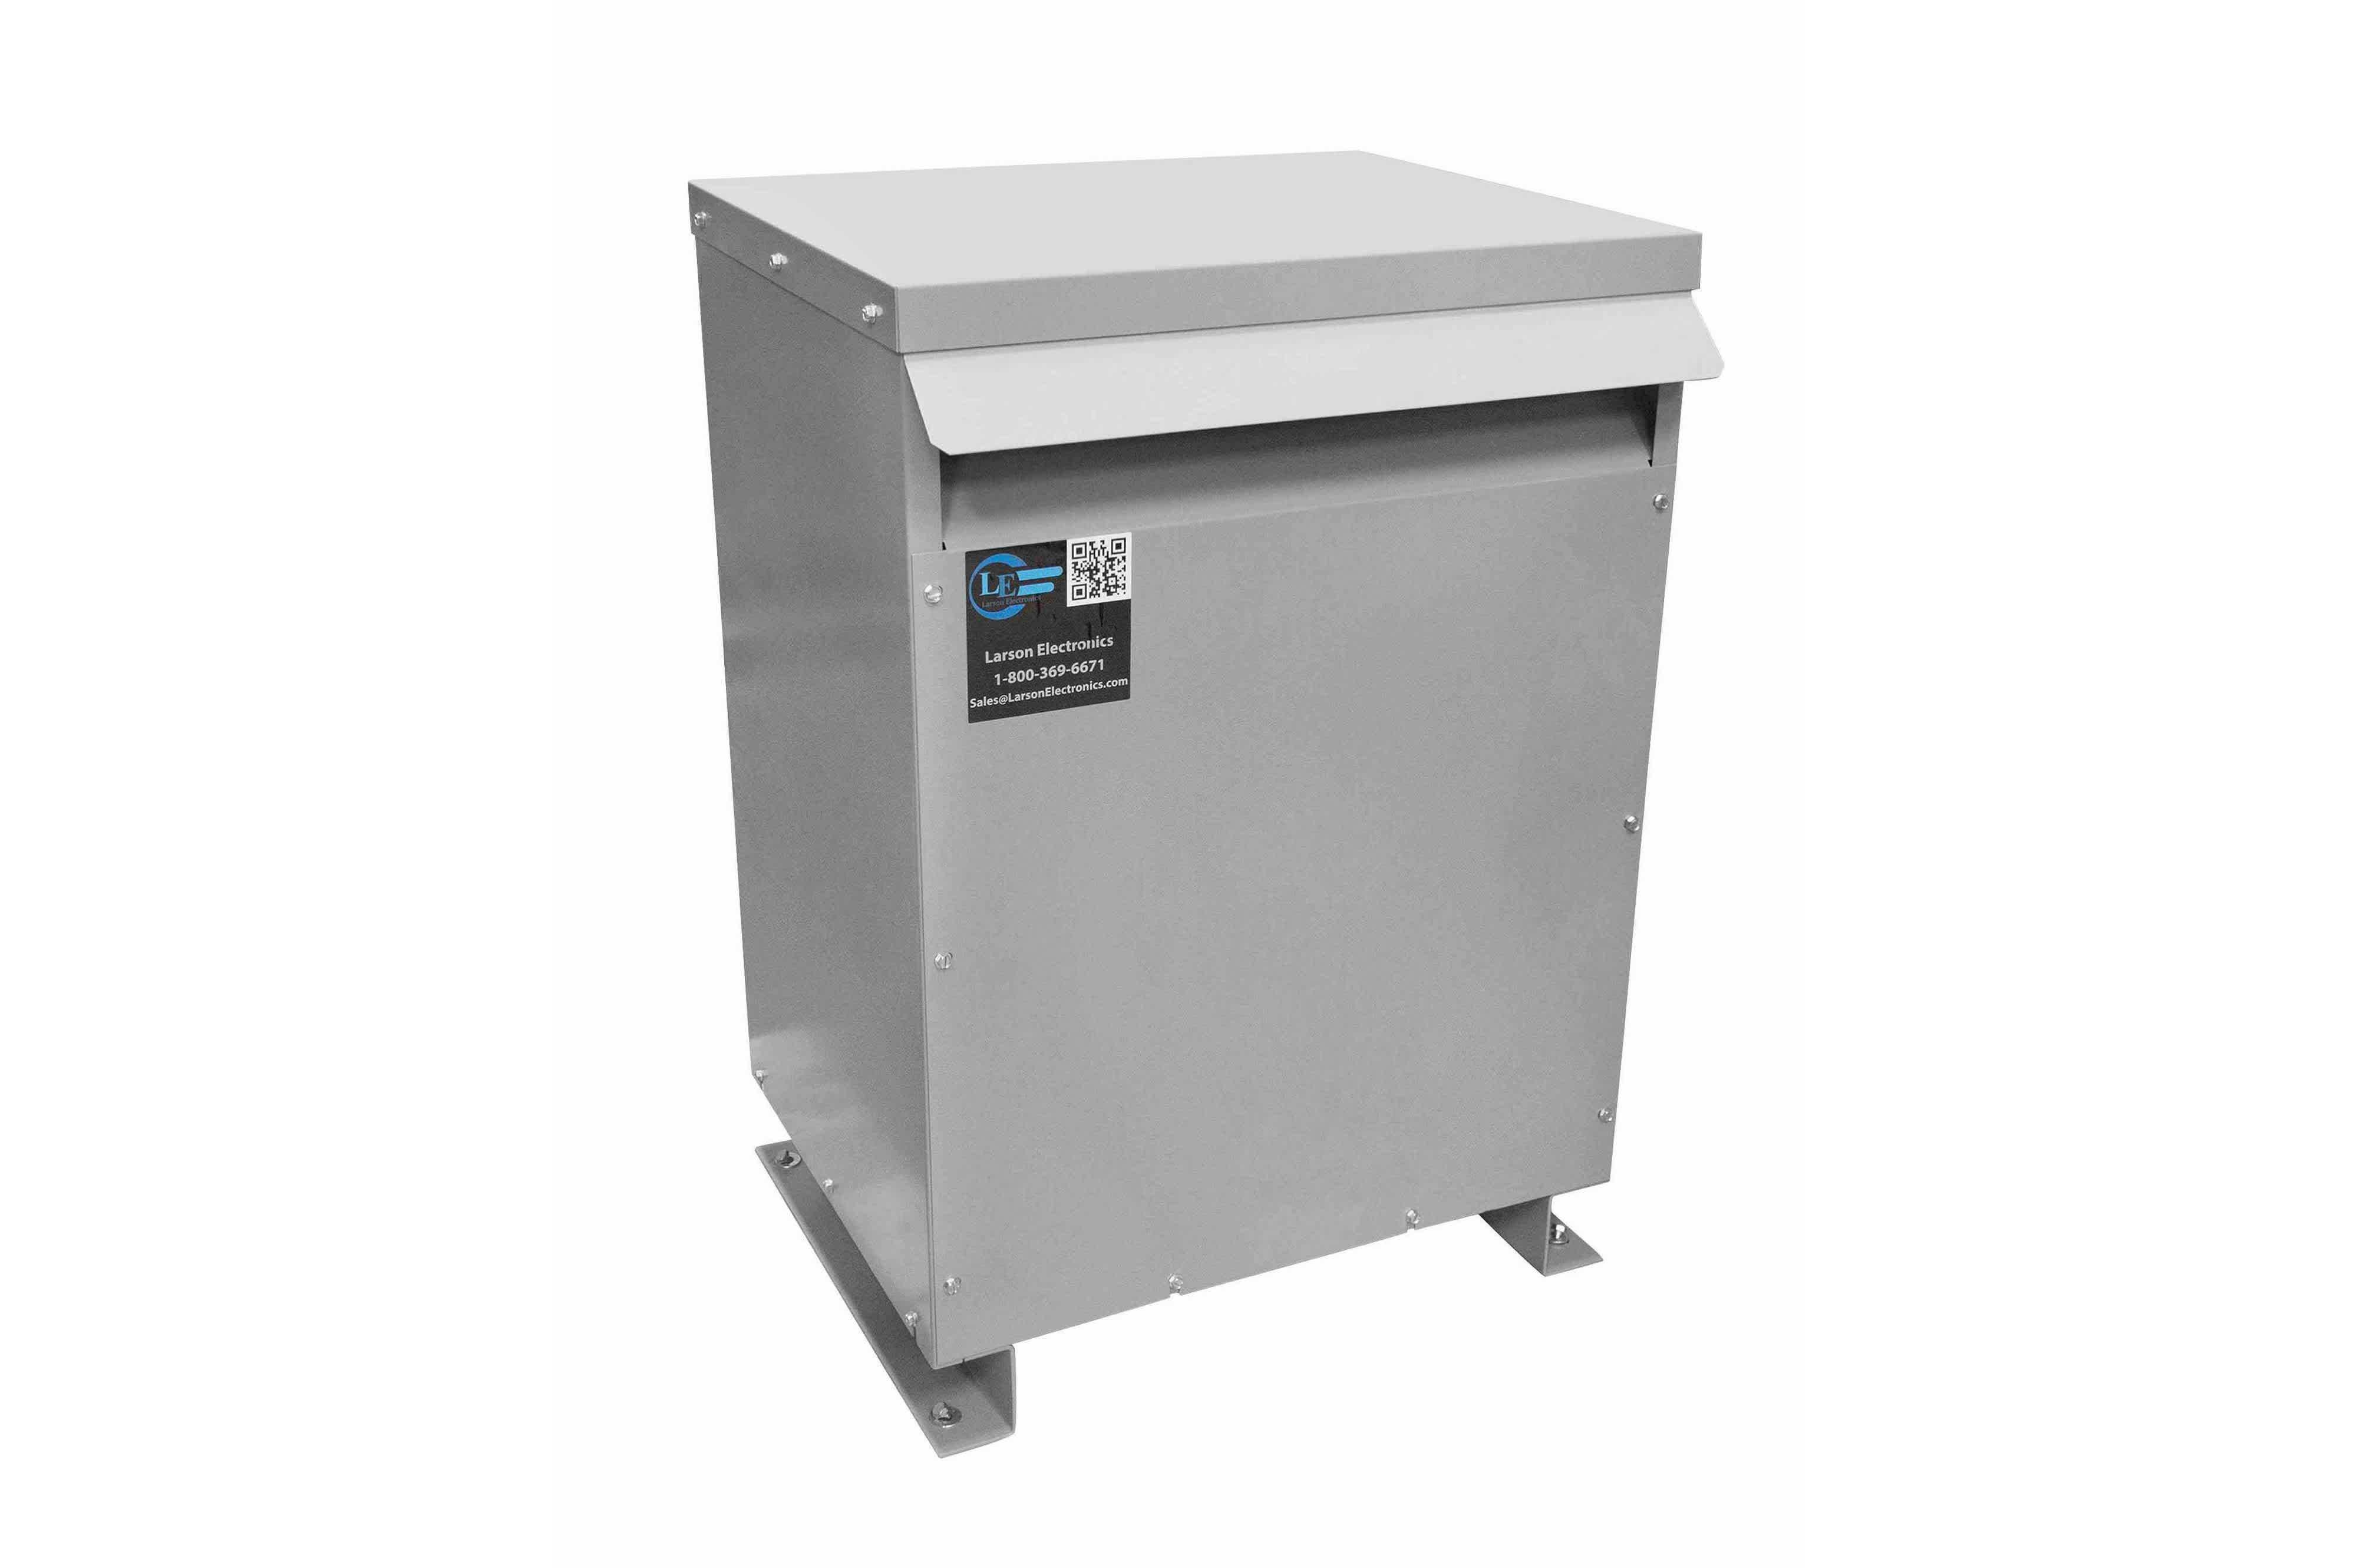 800 kVA 3PH Isolation Transformer, 400V Wye Primary, 208Y/120 Wye-N Secondary, N3R, Ventilated, 60 Hz